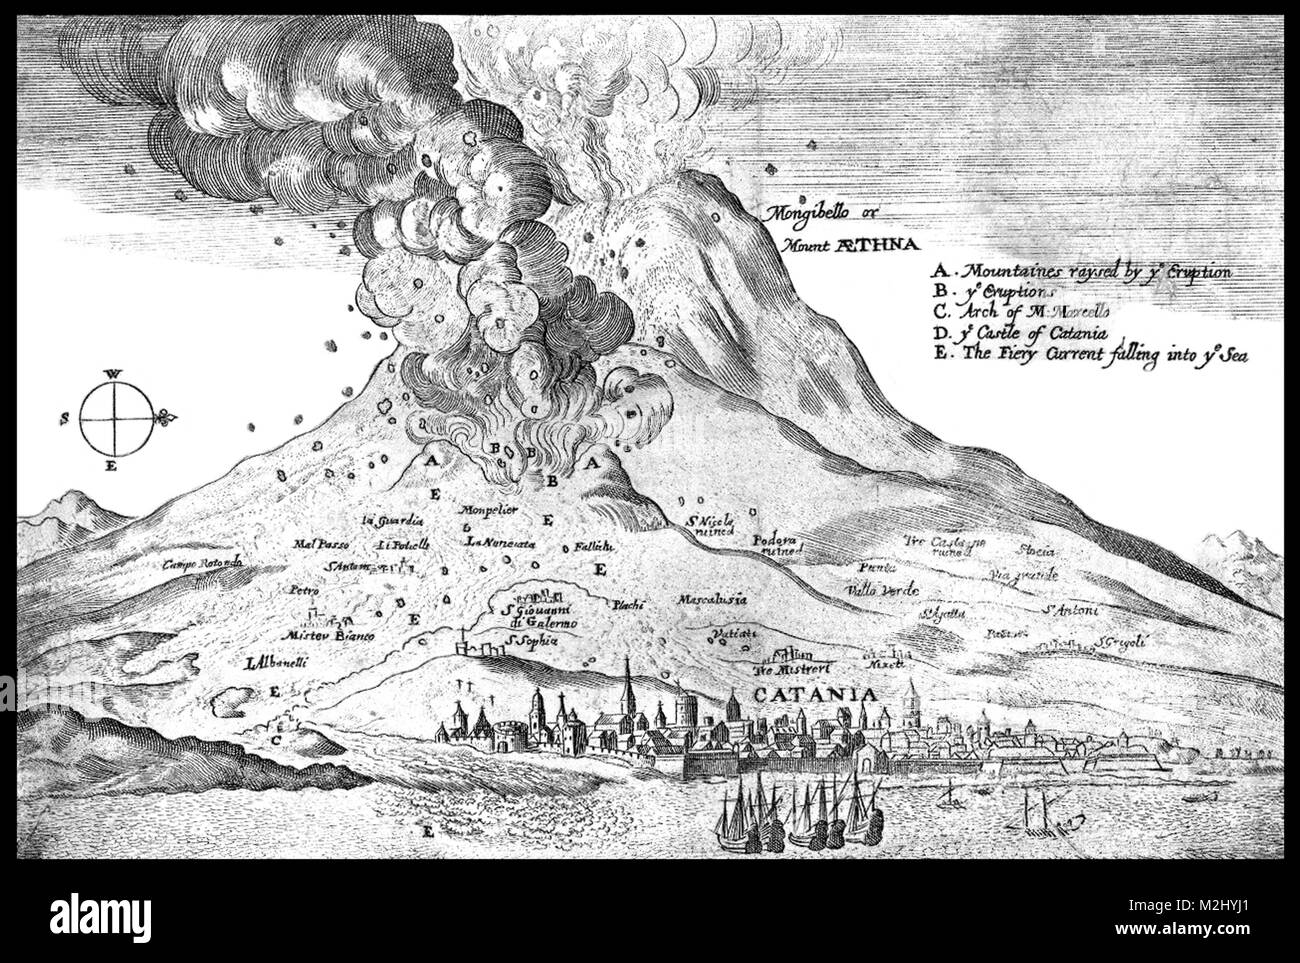 Mount Etna Eruption, 1669 - Stock Image